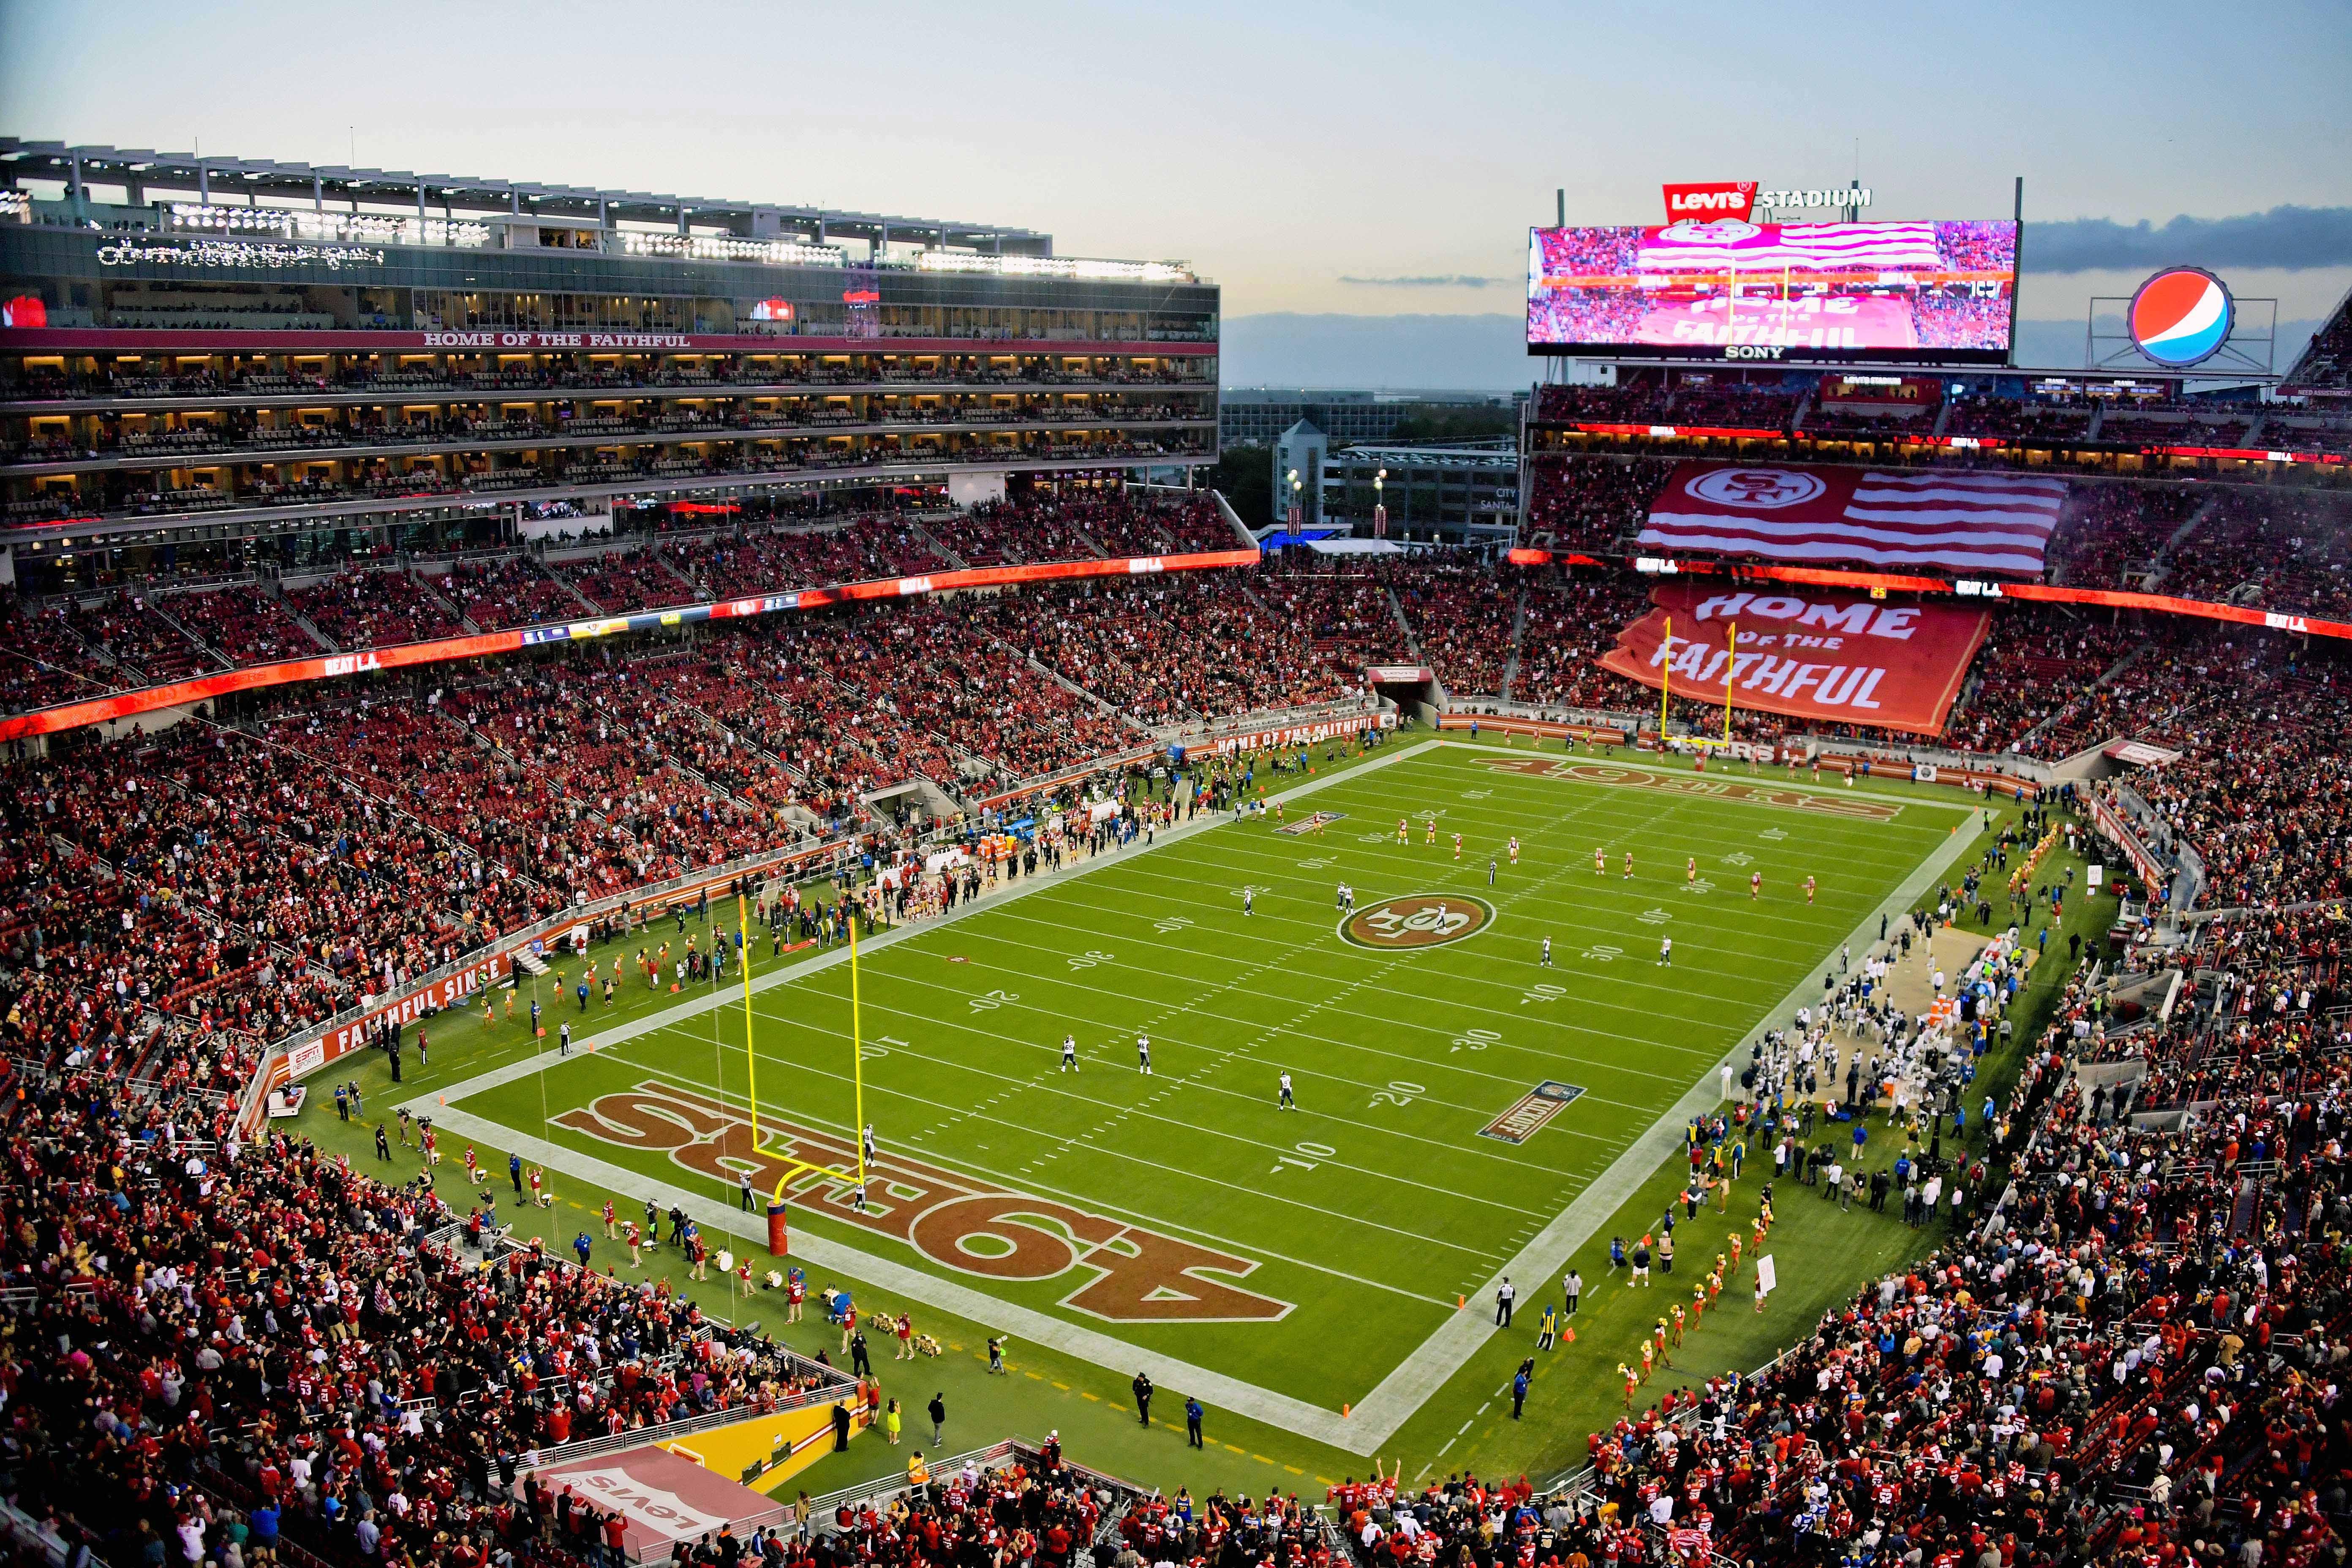 NFL: Los Angeles Rams at San Francisco 49ers